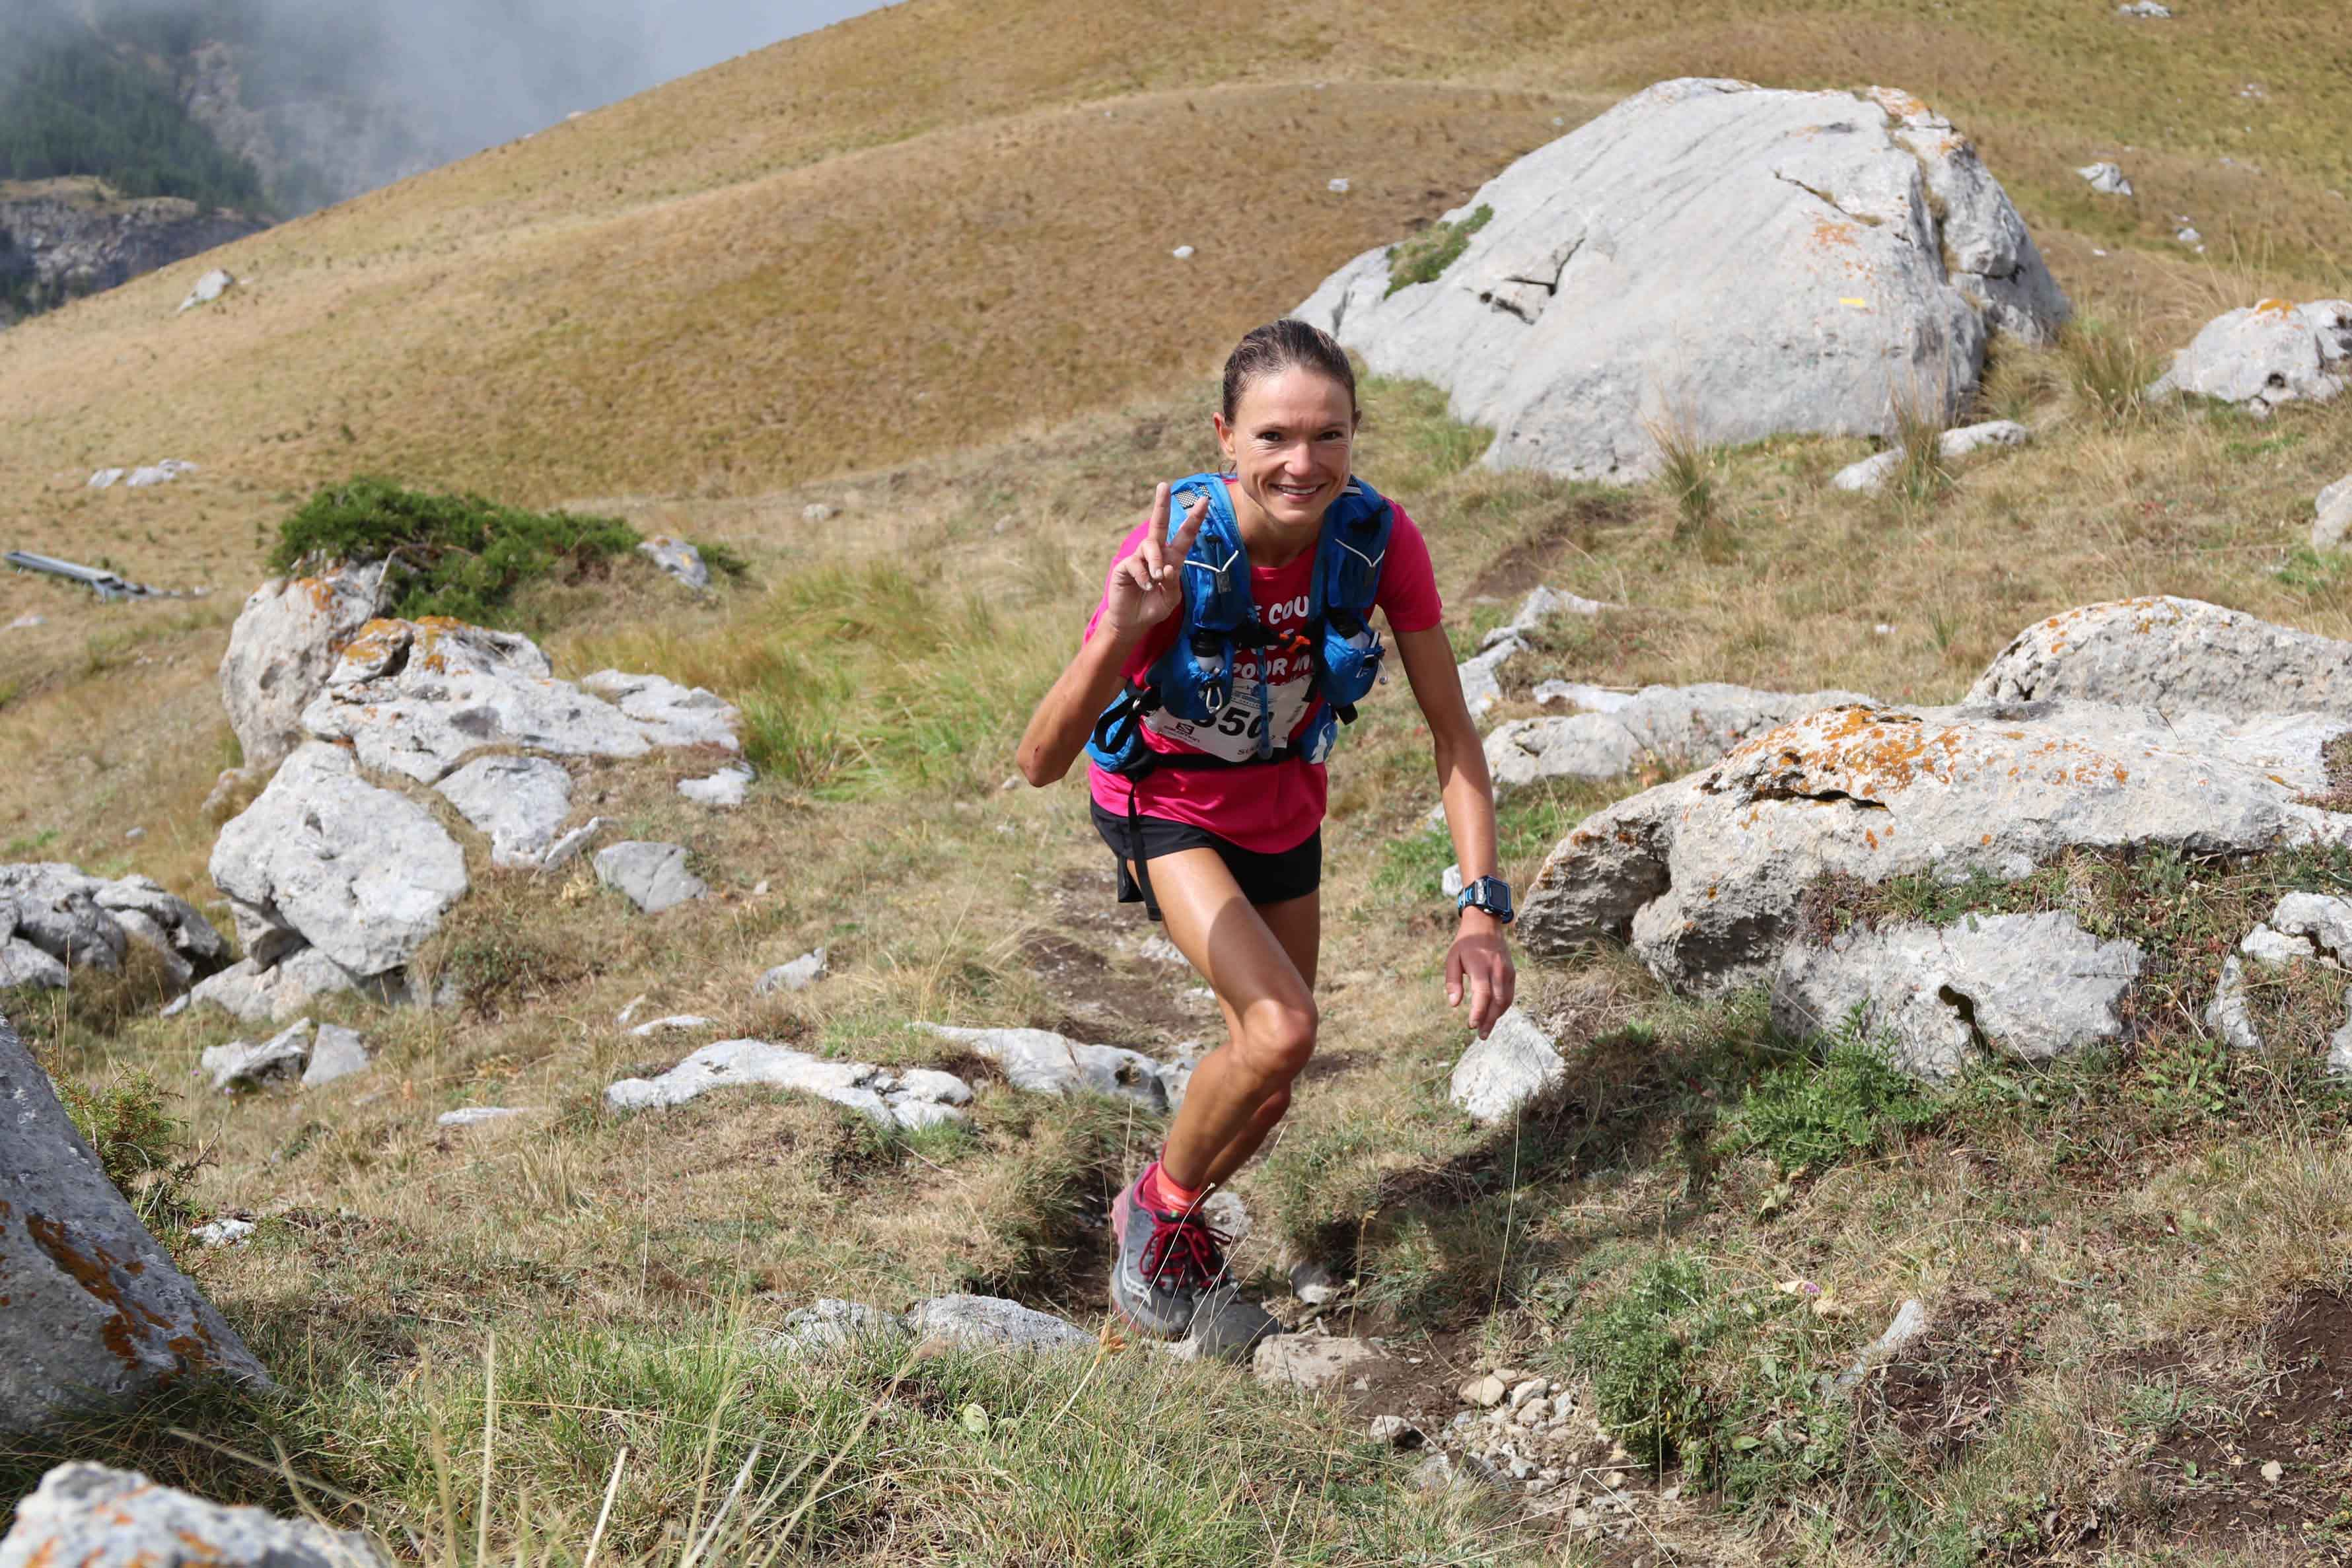 1 Maryline Nakache première 42 km photo Robert Goin - Juliet Champion, Mathieu Martinez et Romain Wyndaele, vainqueurs du Salomon Over the Mountain Running Challenge 2017